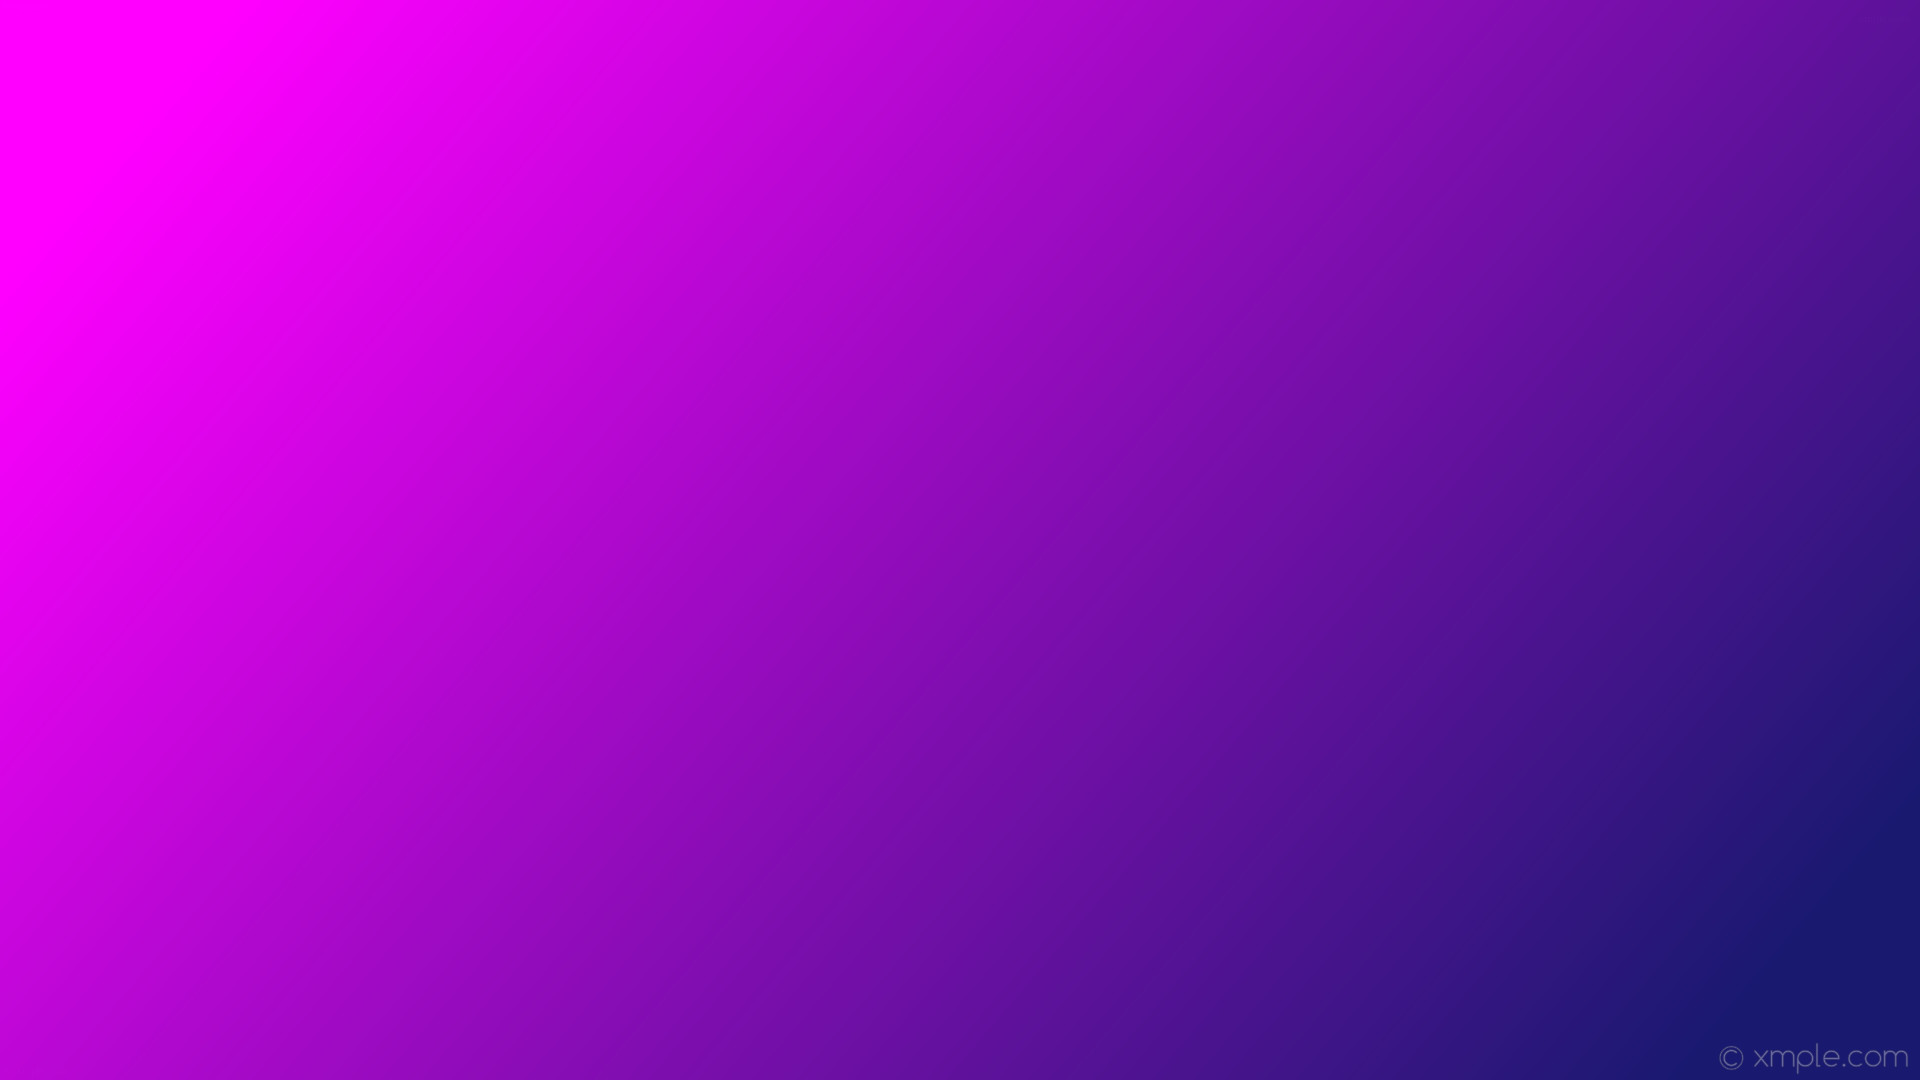 wallpaper blue purple gradient linear midnight blue magenta #191970 #ff00ff  345°